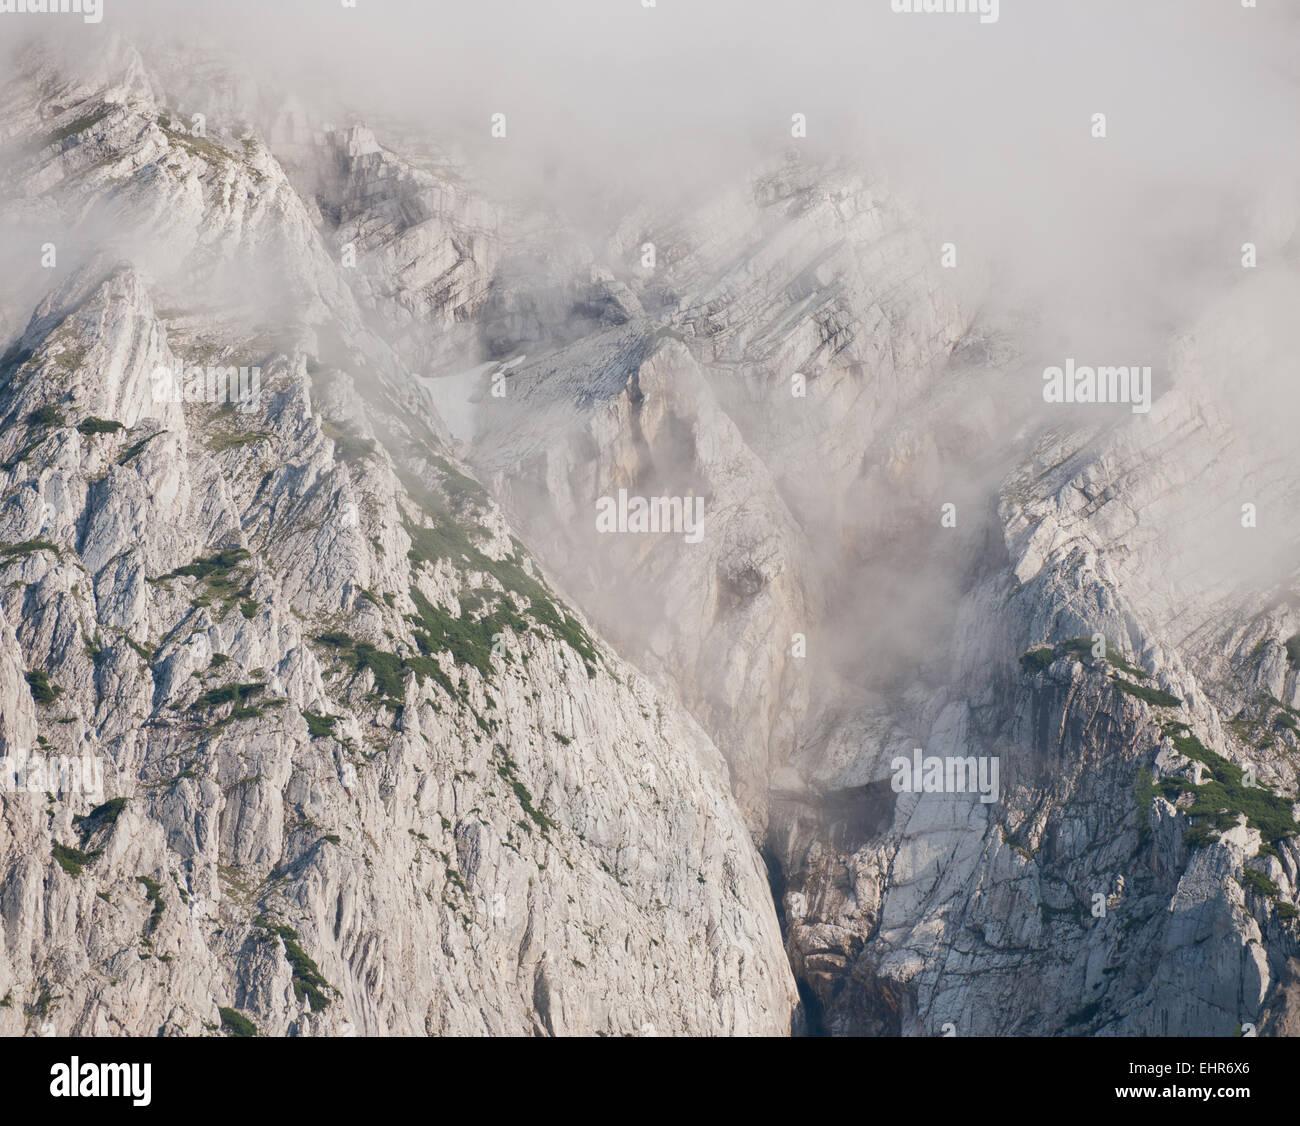 Grimming im Nebel, Salzkammergut, Styria, Austria - Stock Image